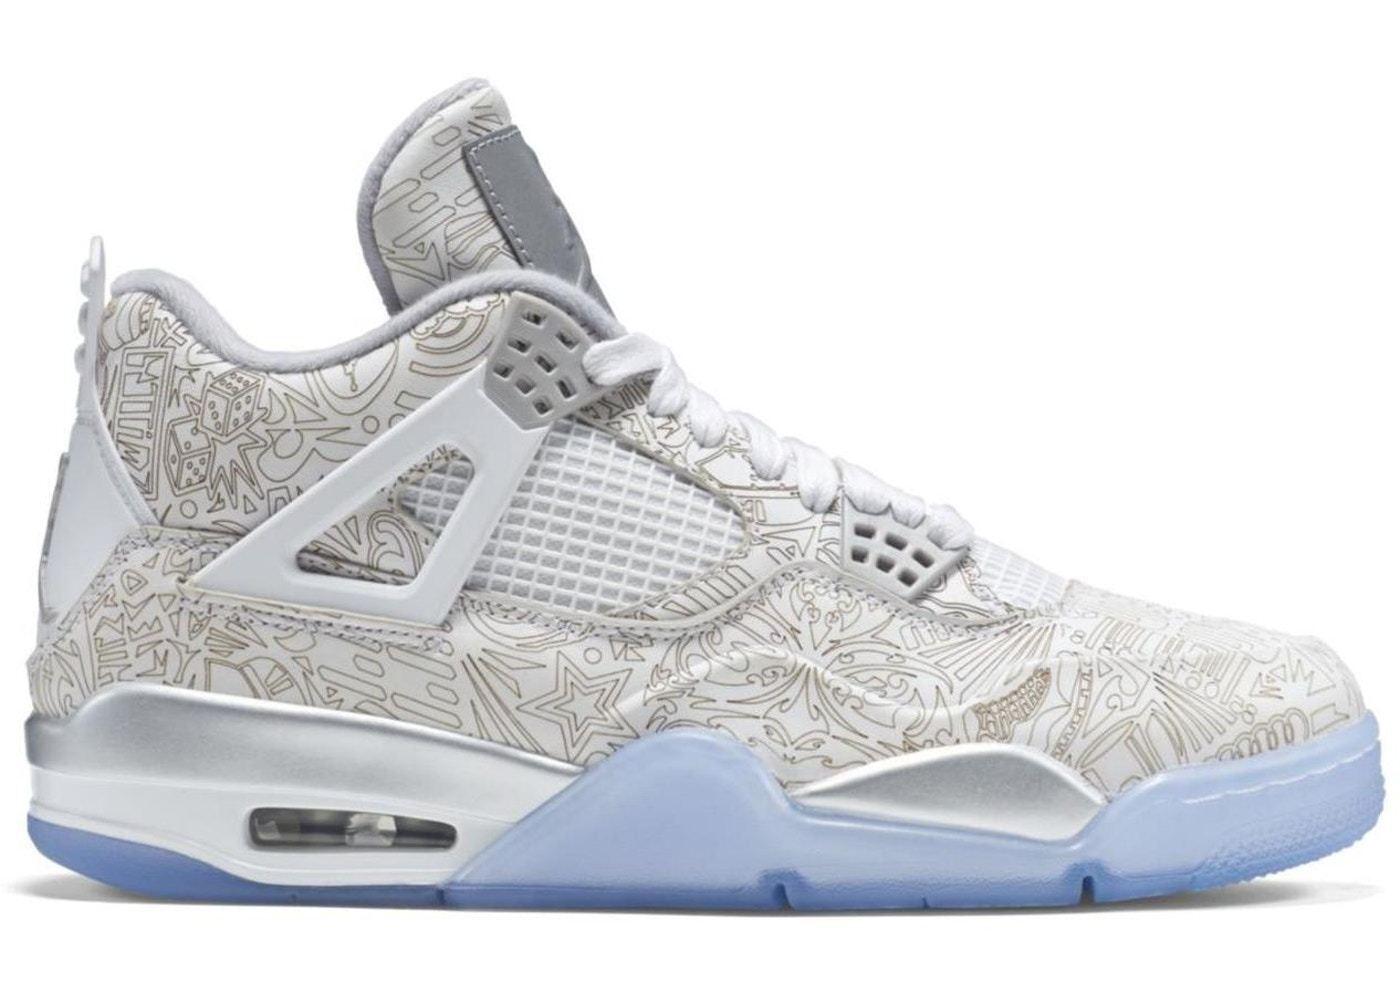 Nike calcetines Air Jordan 4 retro láser calcetines Nike cortos zapatos bb7c37